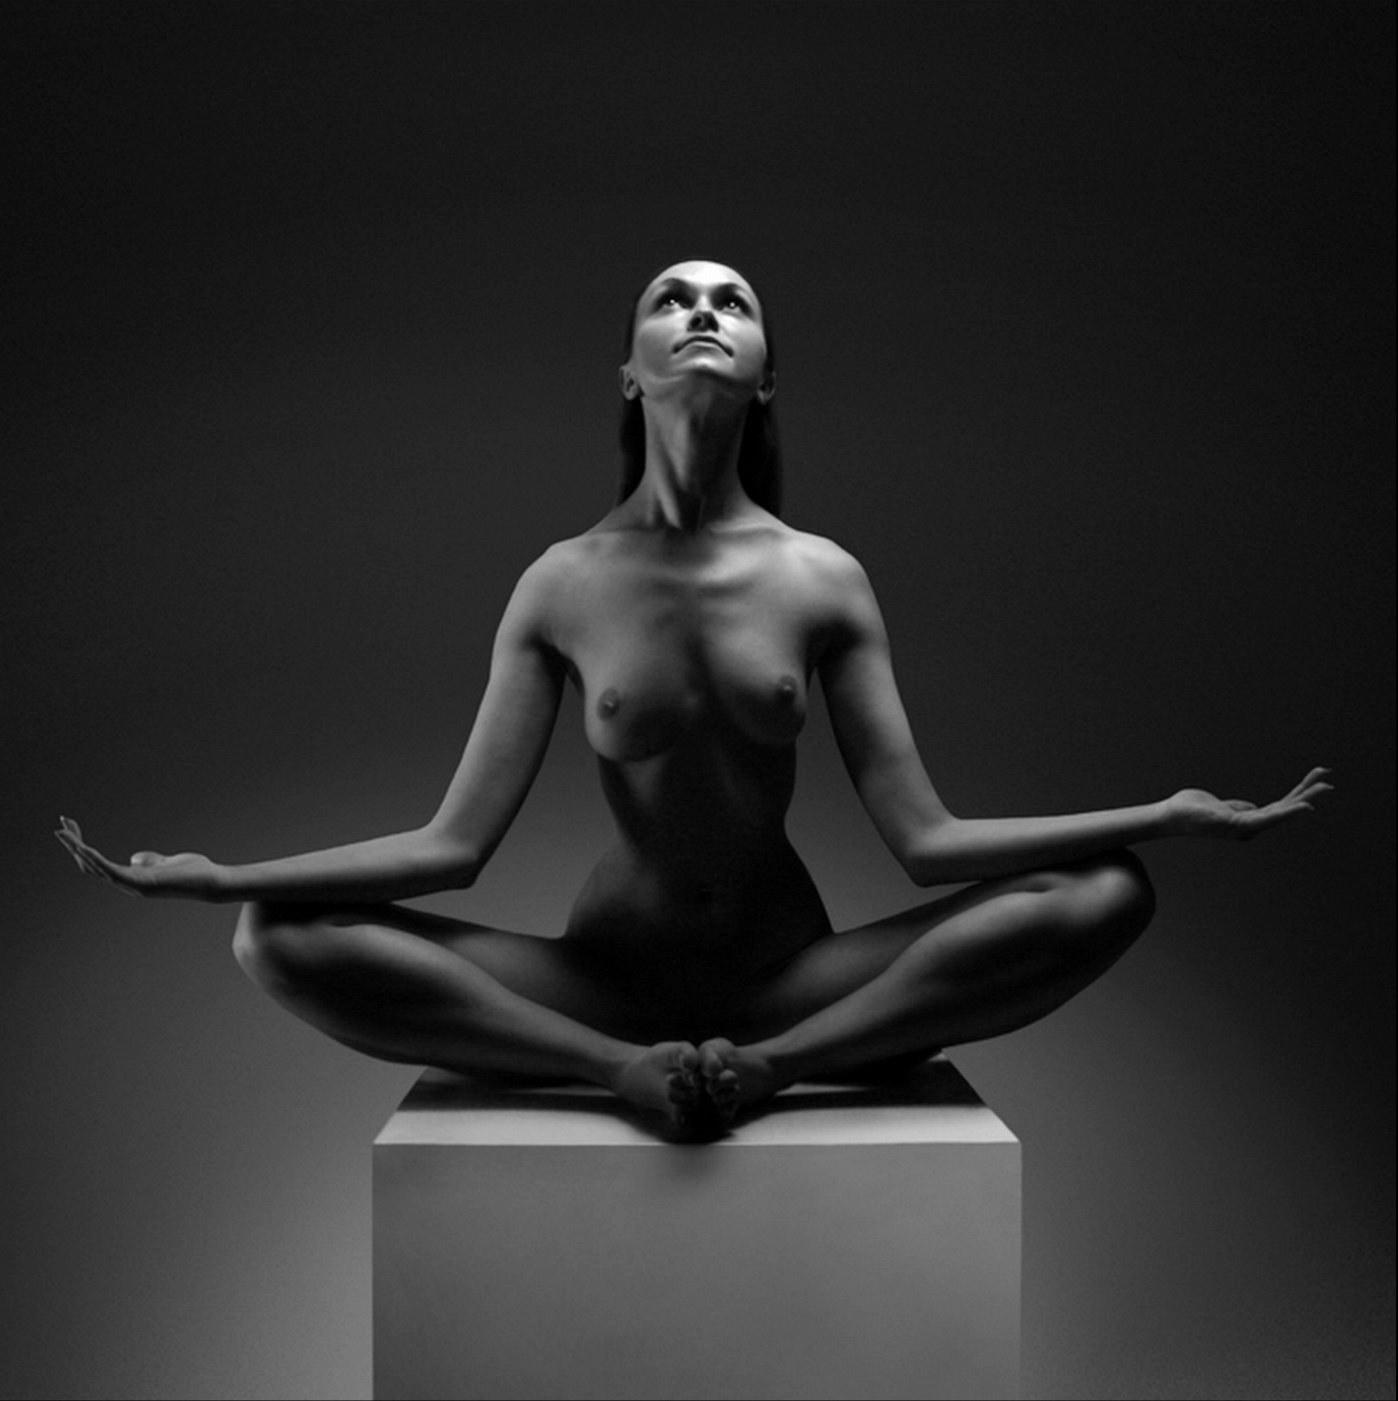 Desnudos Art Sticos En Fotograf A De Jewarda